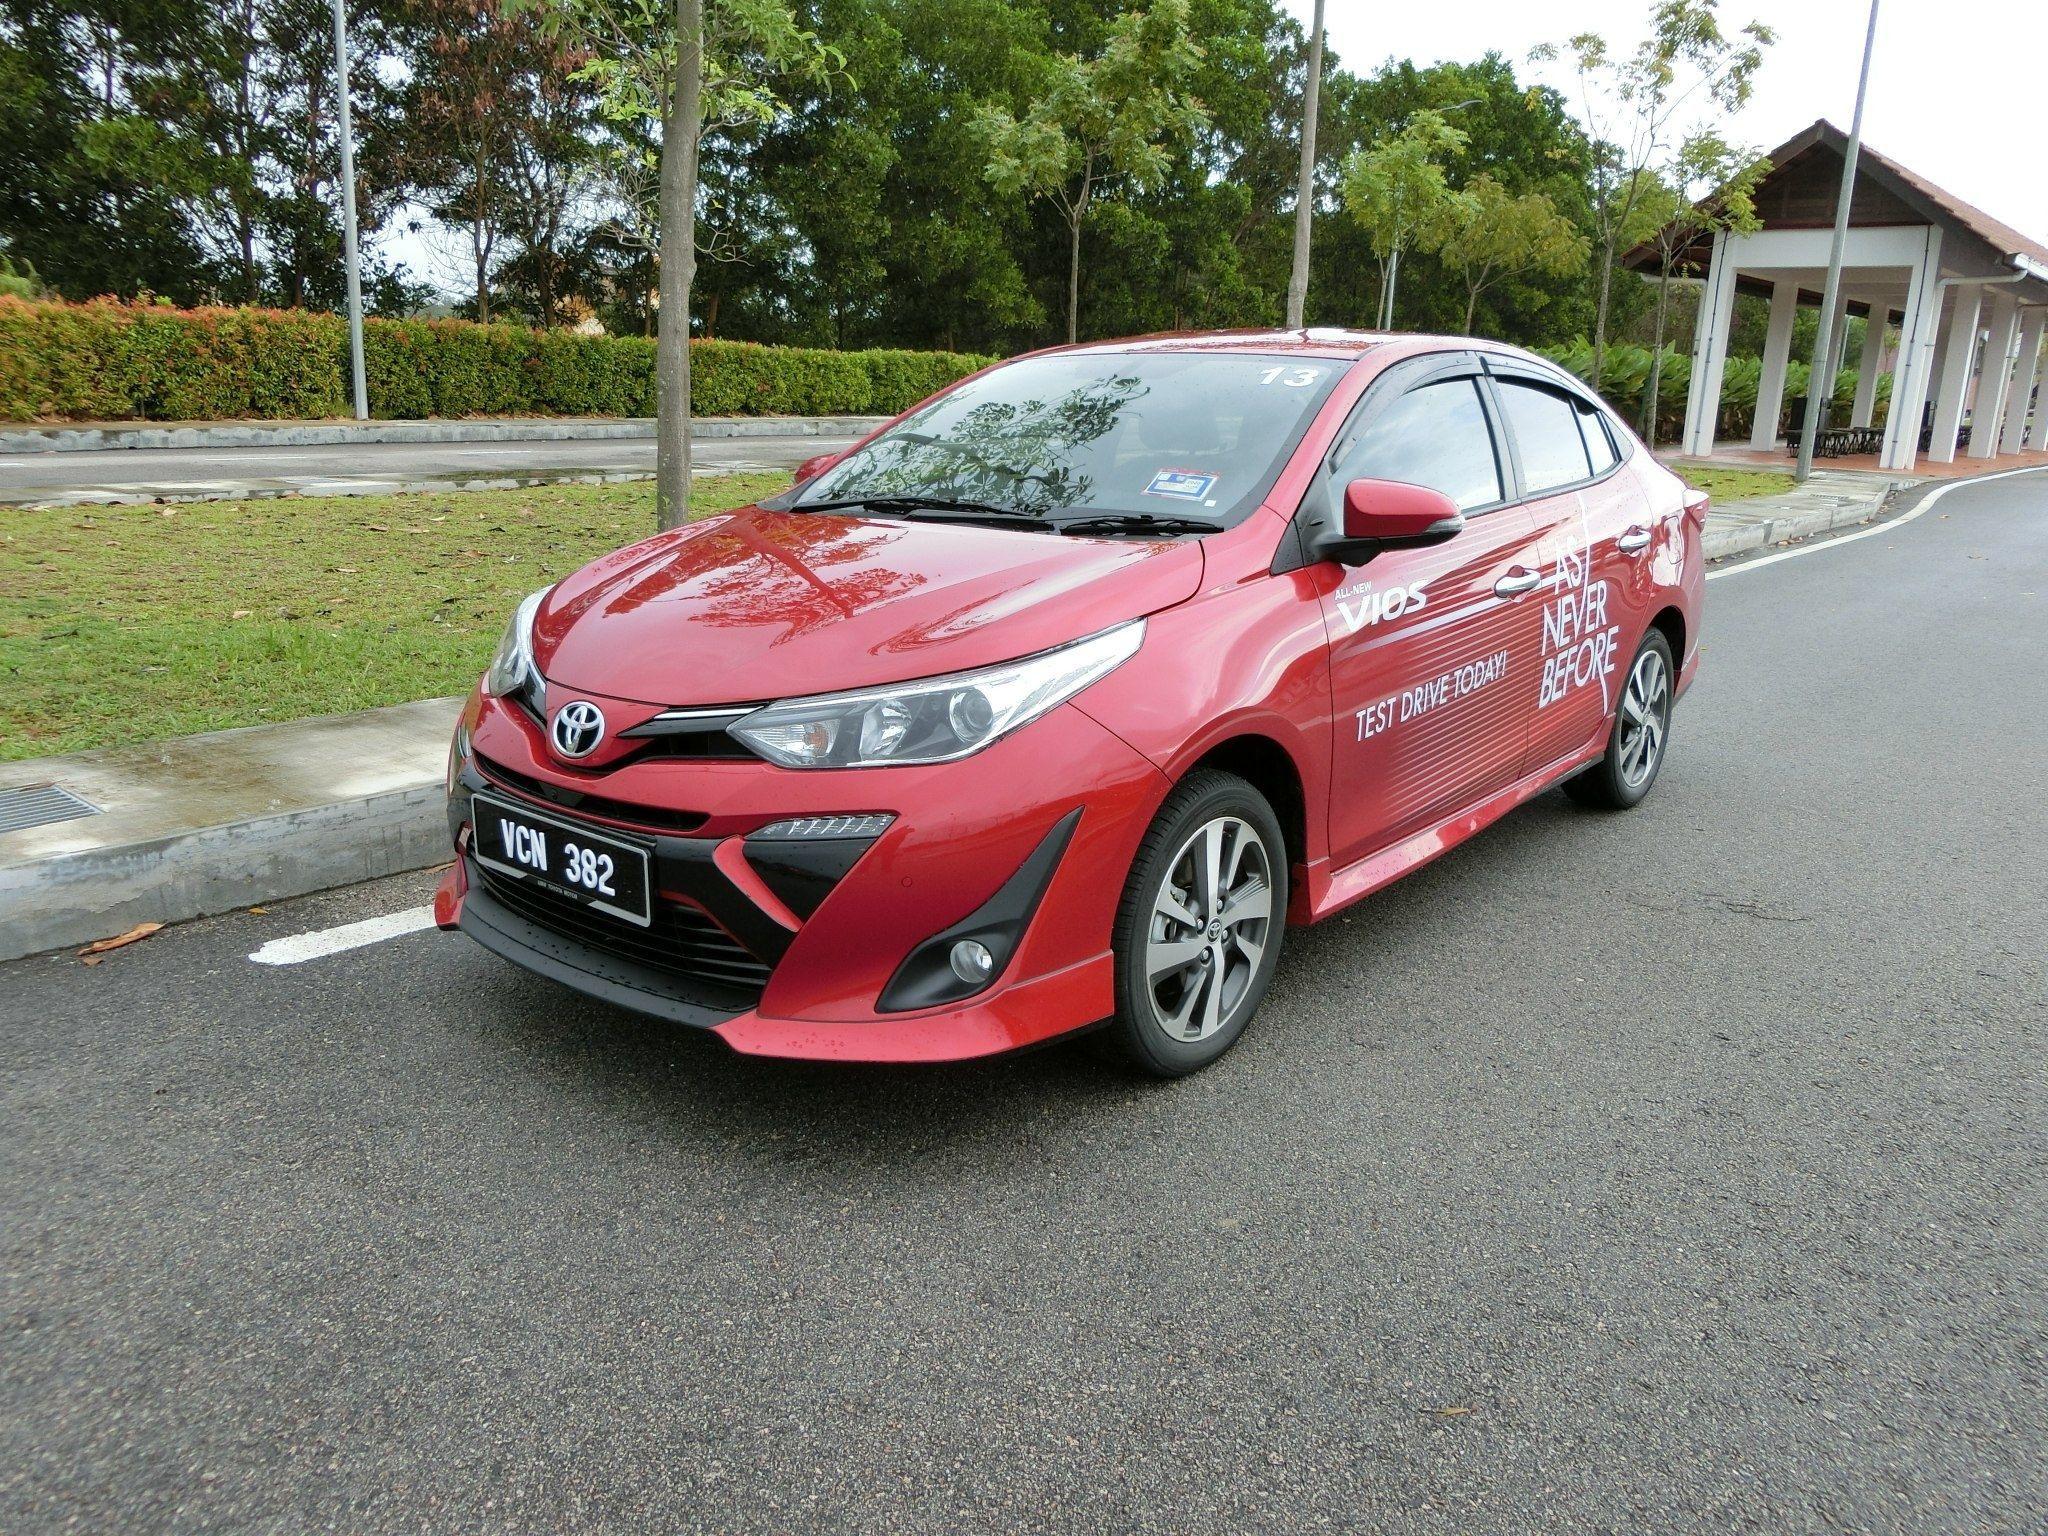 Toyota Vios 2020 Spy Shoot Di 2020 Modifikasi Mobil Mobil